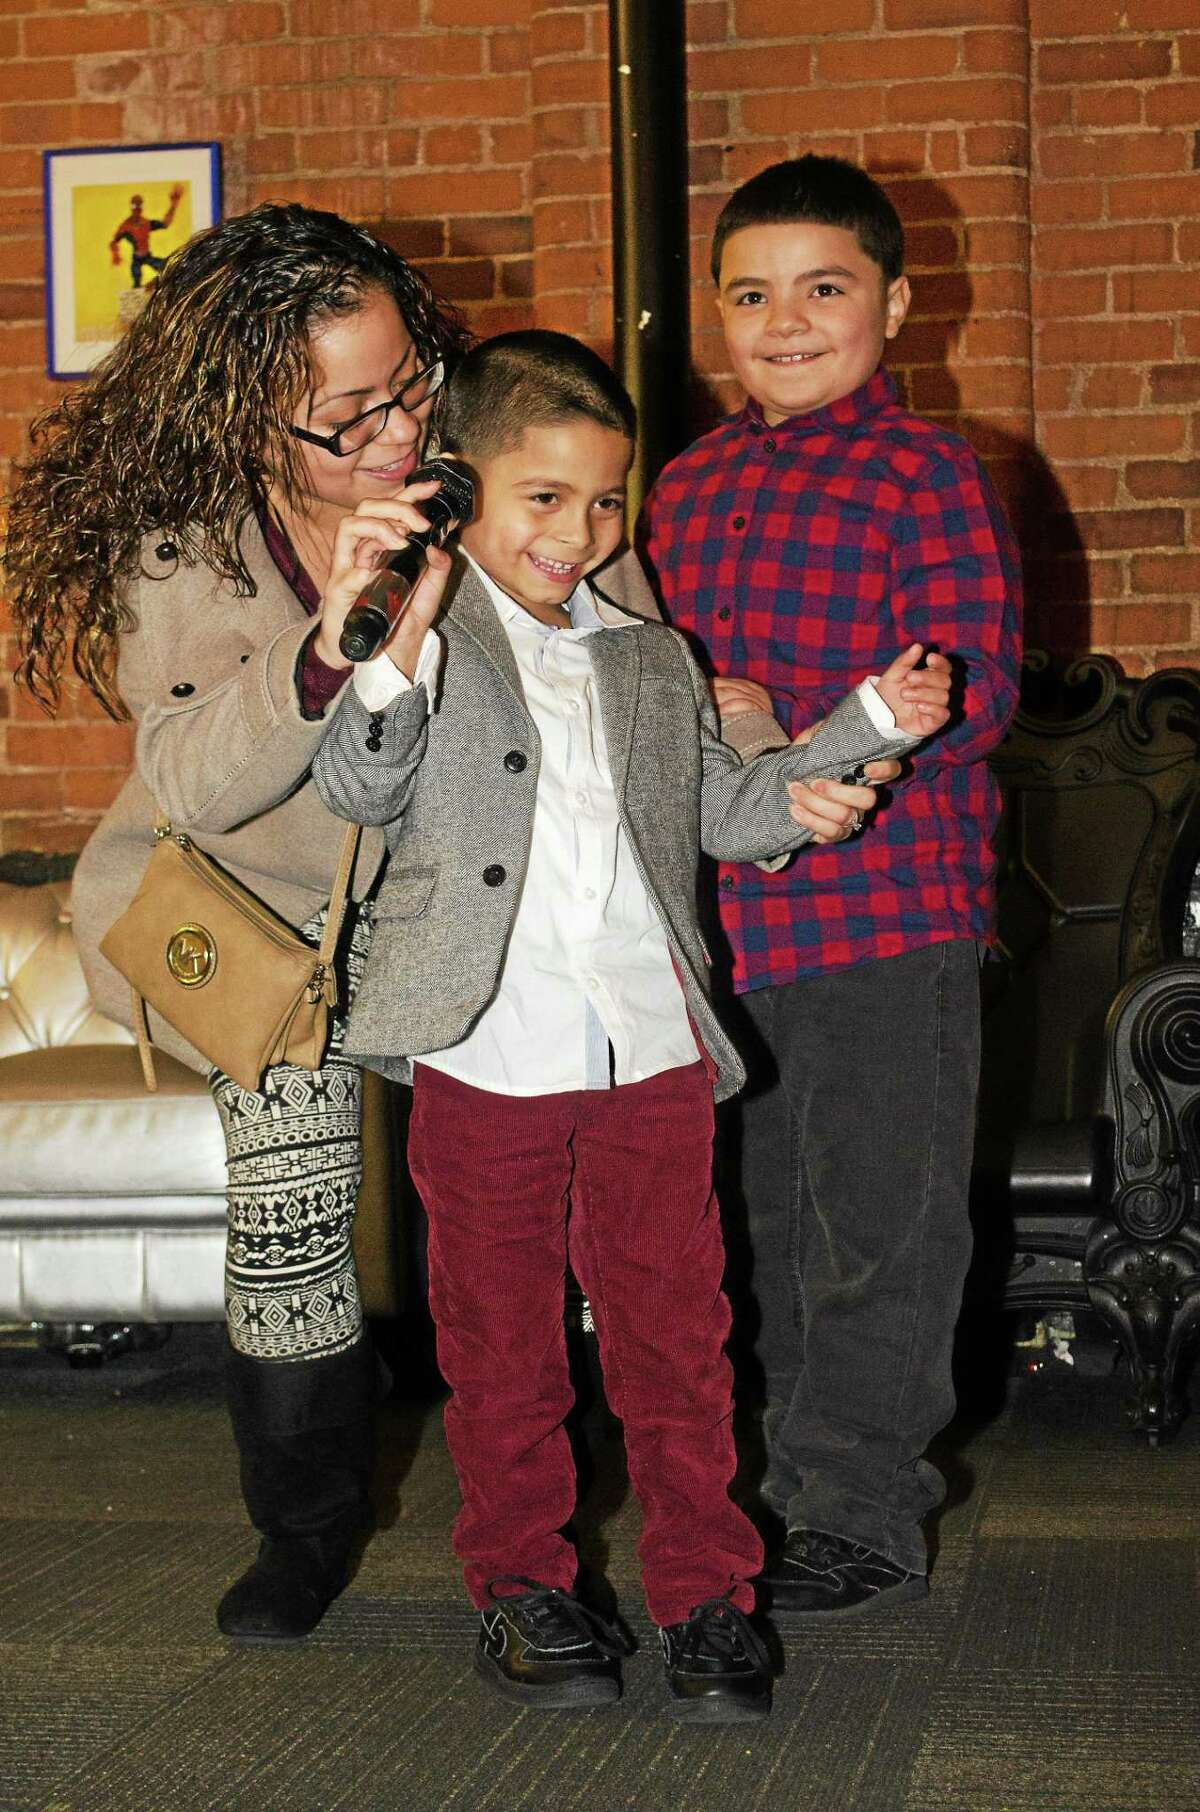 Adrian Laureano accompanied by his mother, Jasmine Gonzalez, and his brother, Josue Alvarez.